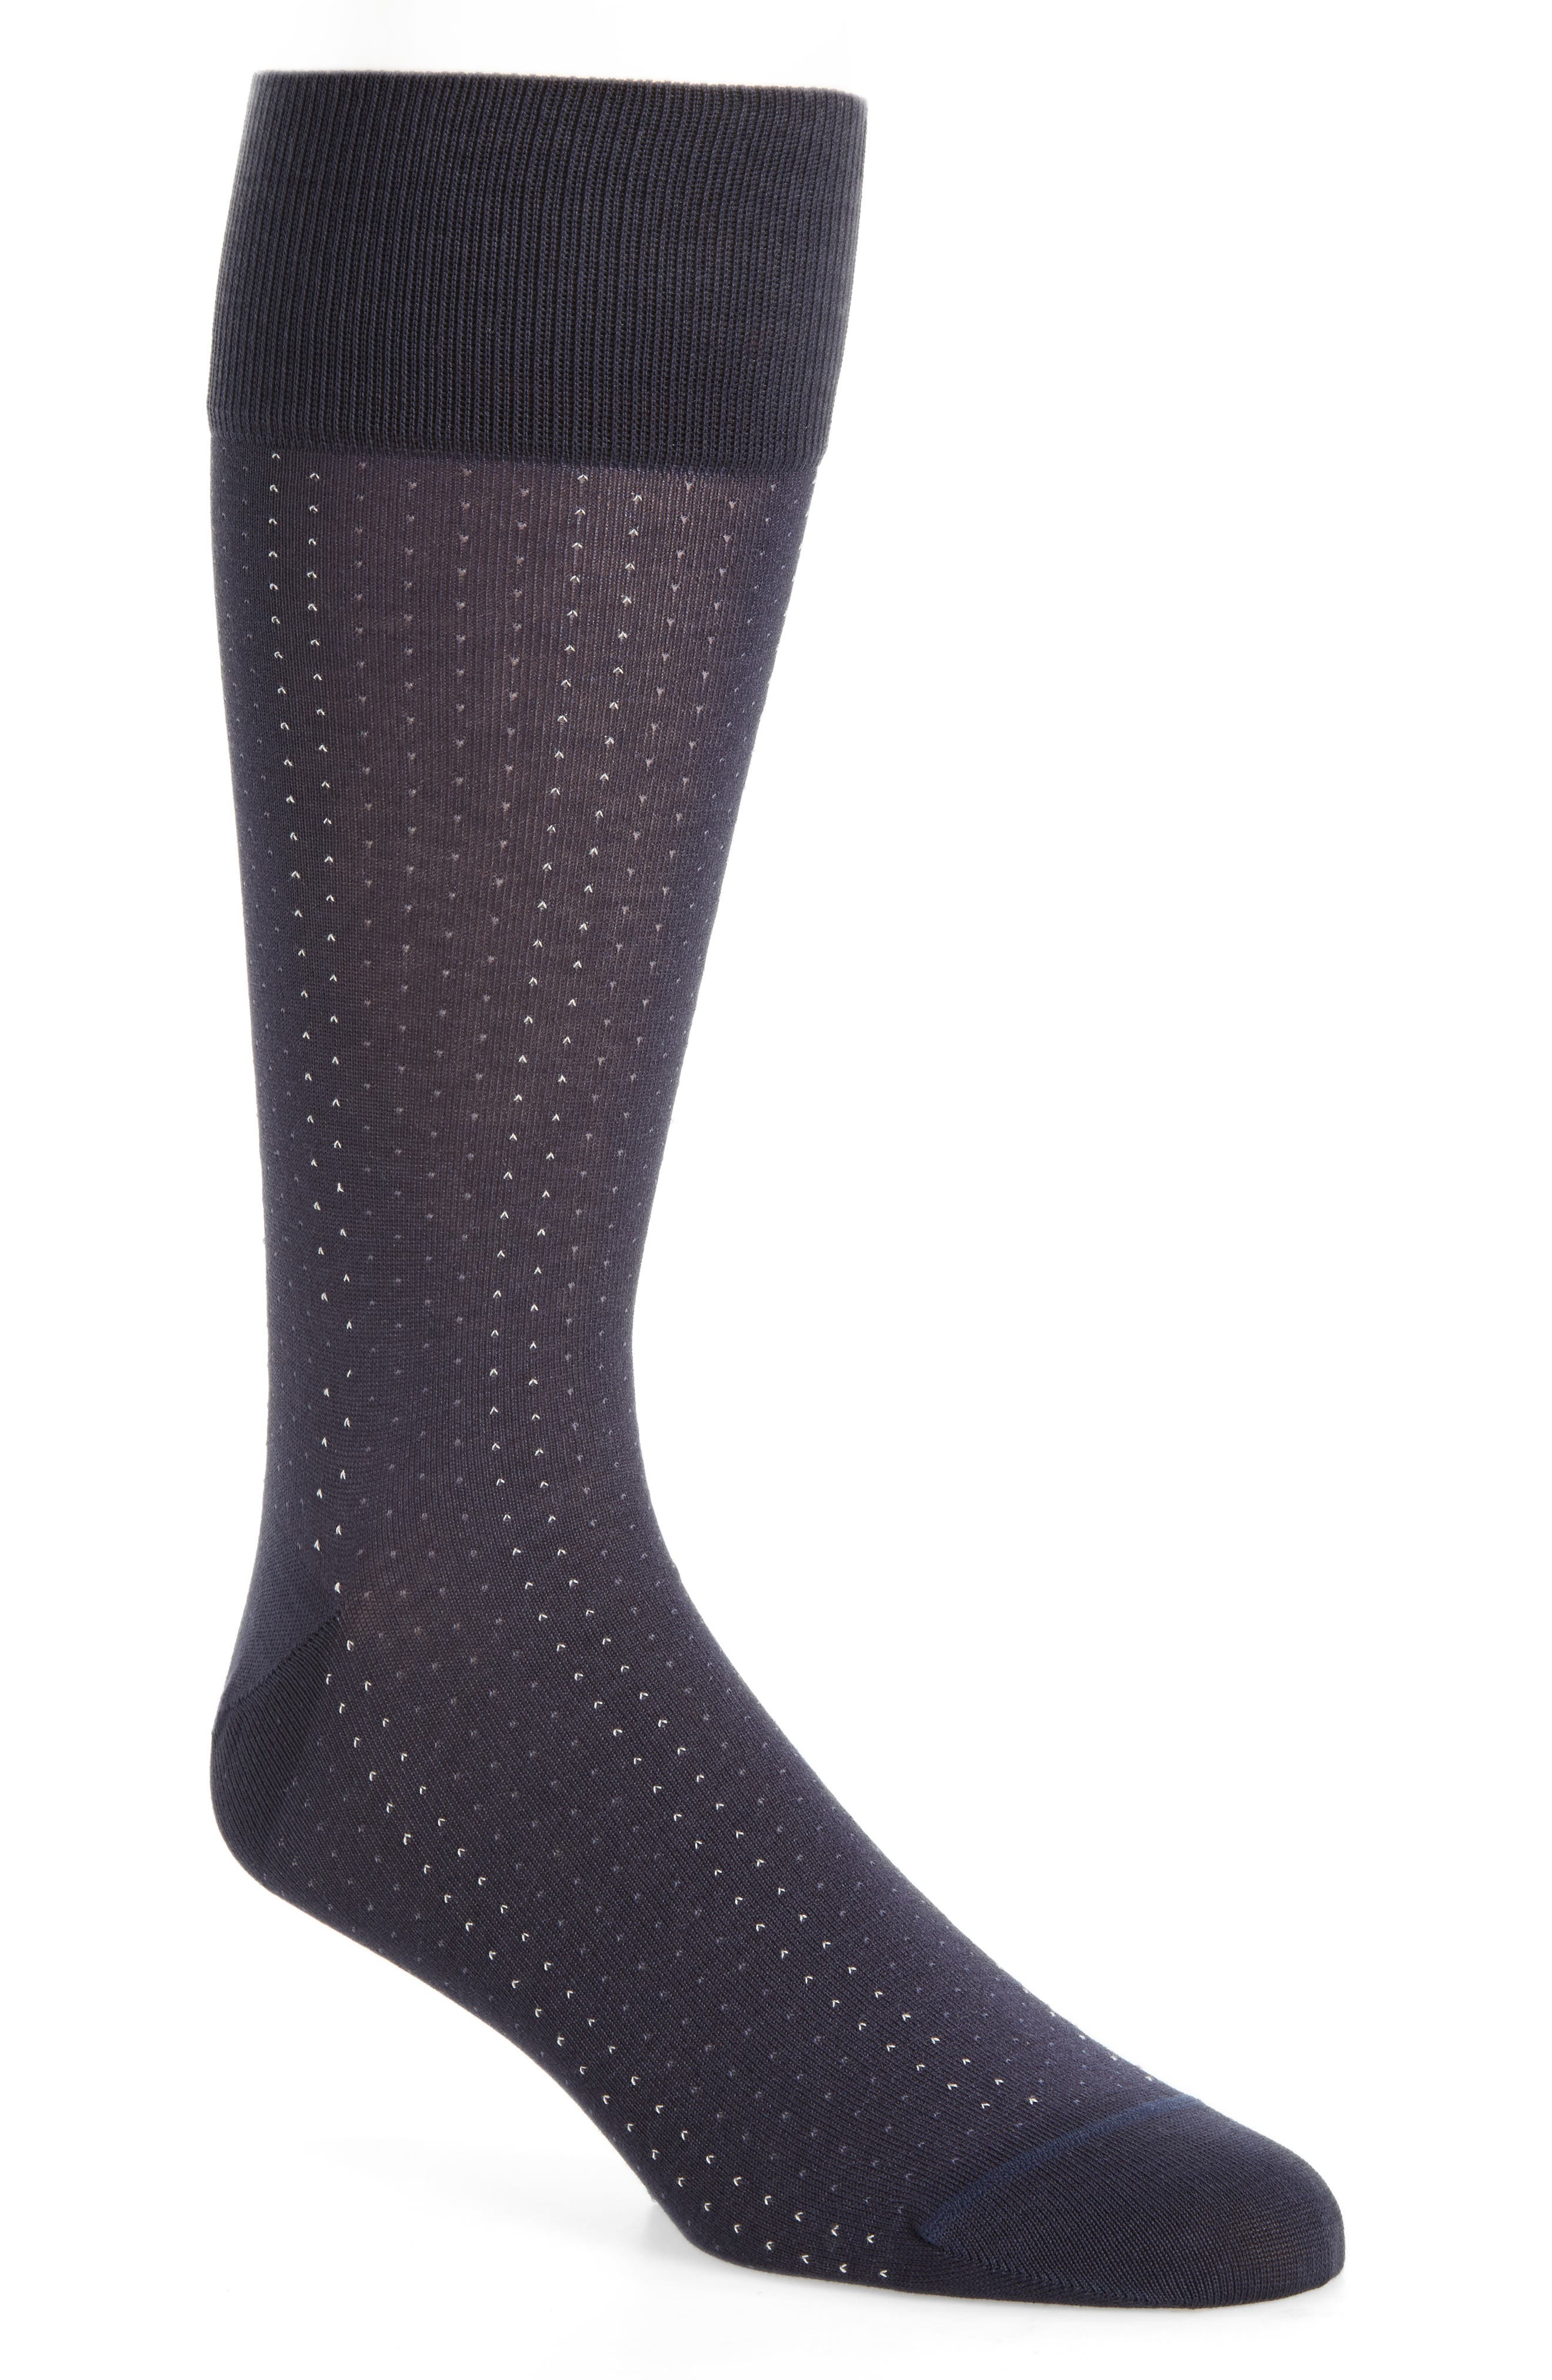 Birdseye Socks,                         Main,                         color, Navy/ Blue